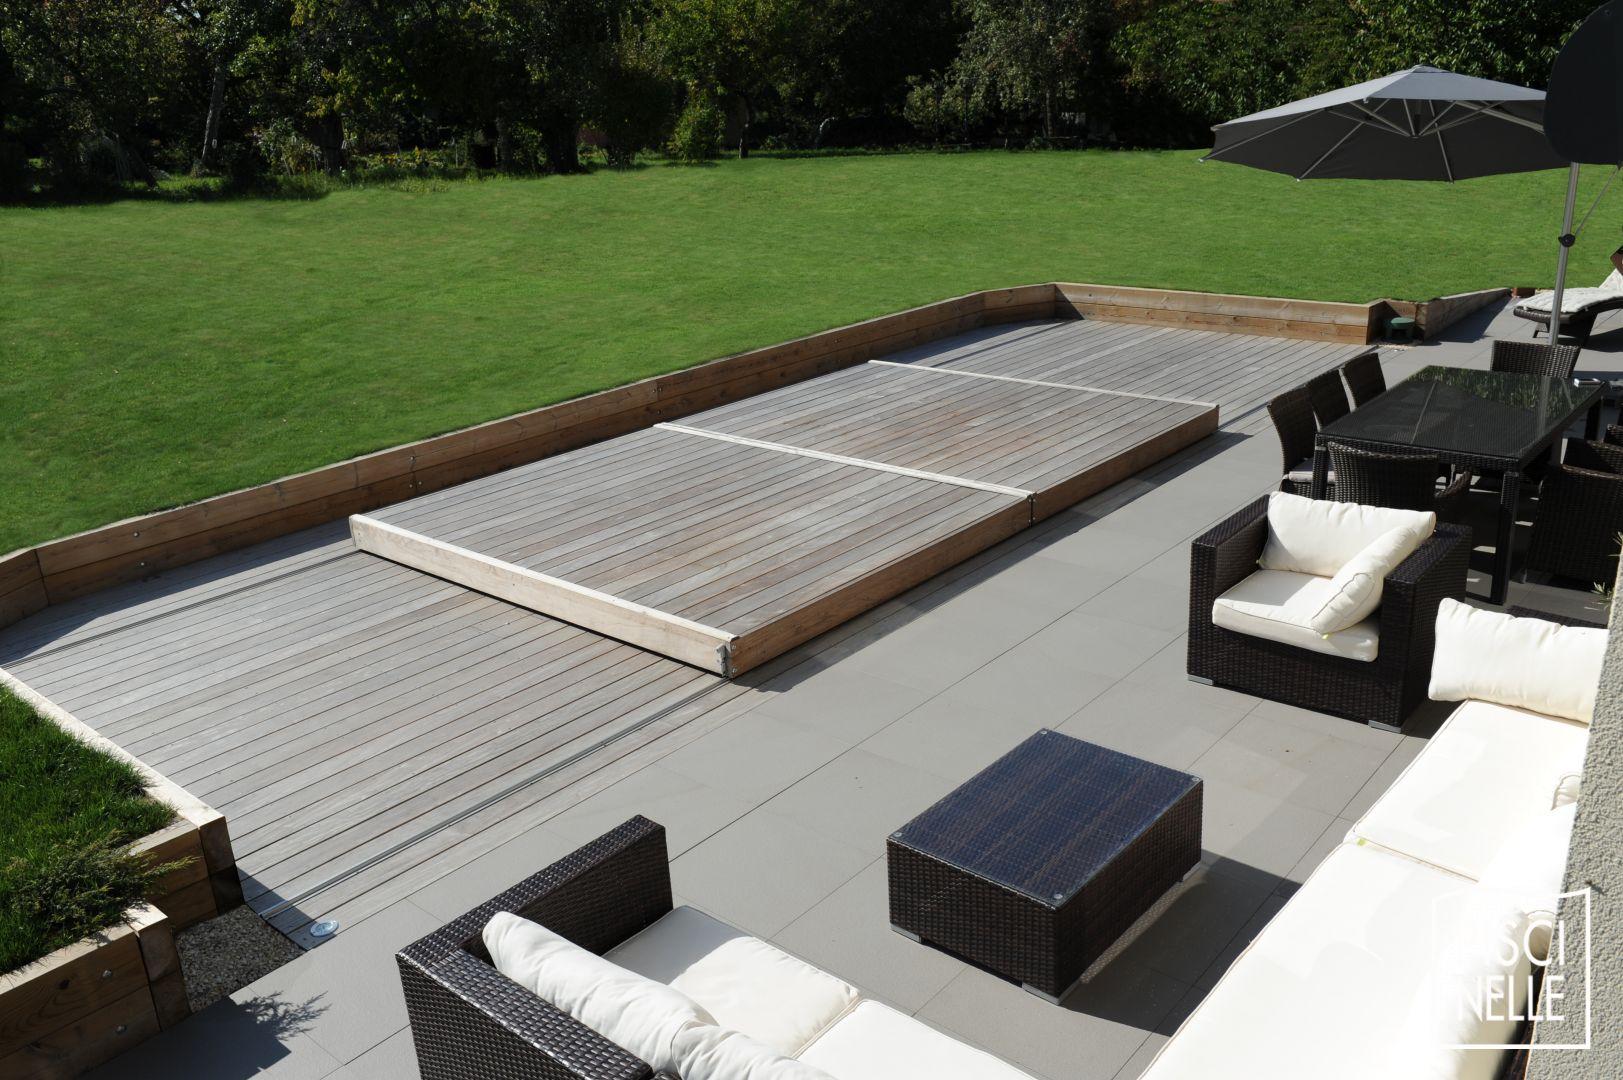 Terrasse Piscine Mobile : Le Rolling-Deck Piscinelle ... à Piscine 3X3